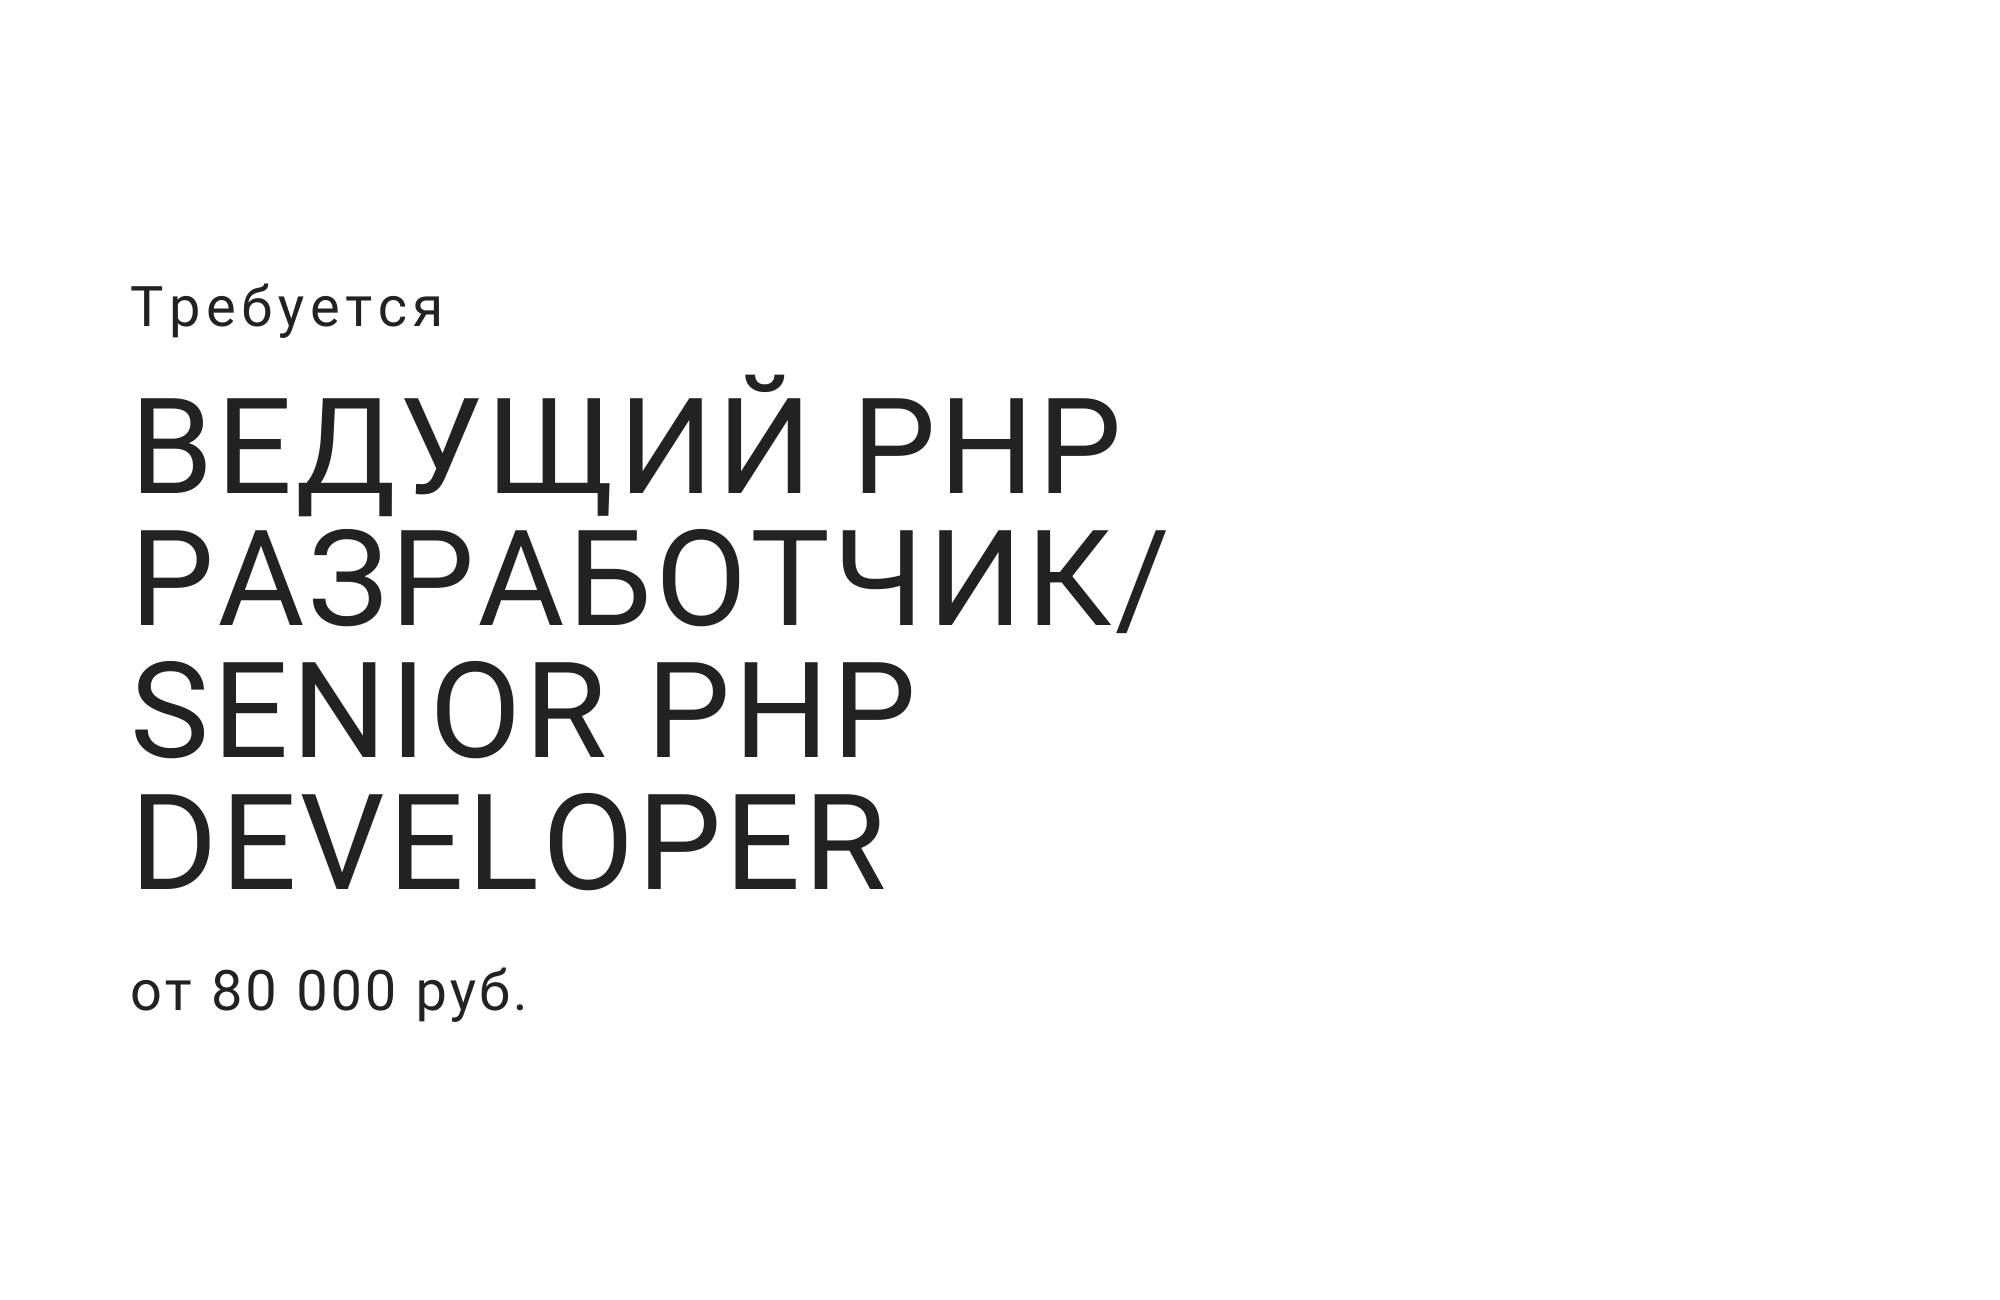 Ведущий PHP разработчик/ Senior PHP Developer